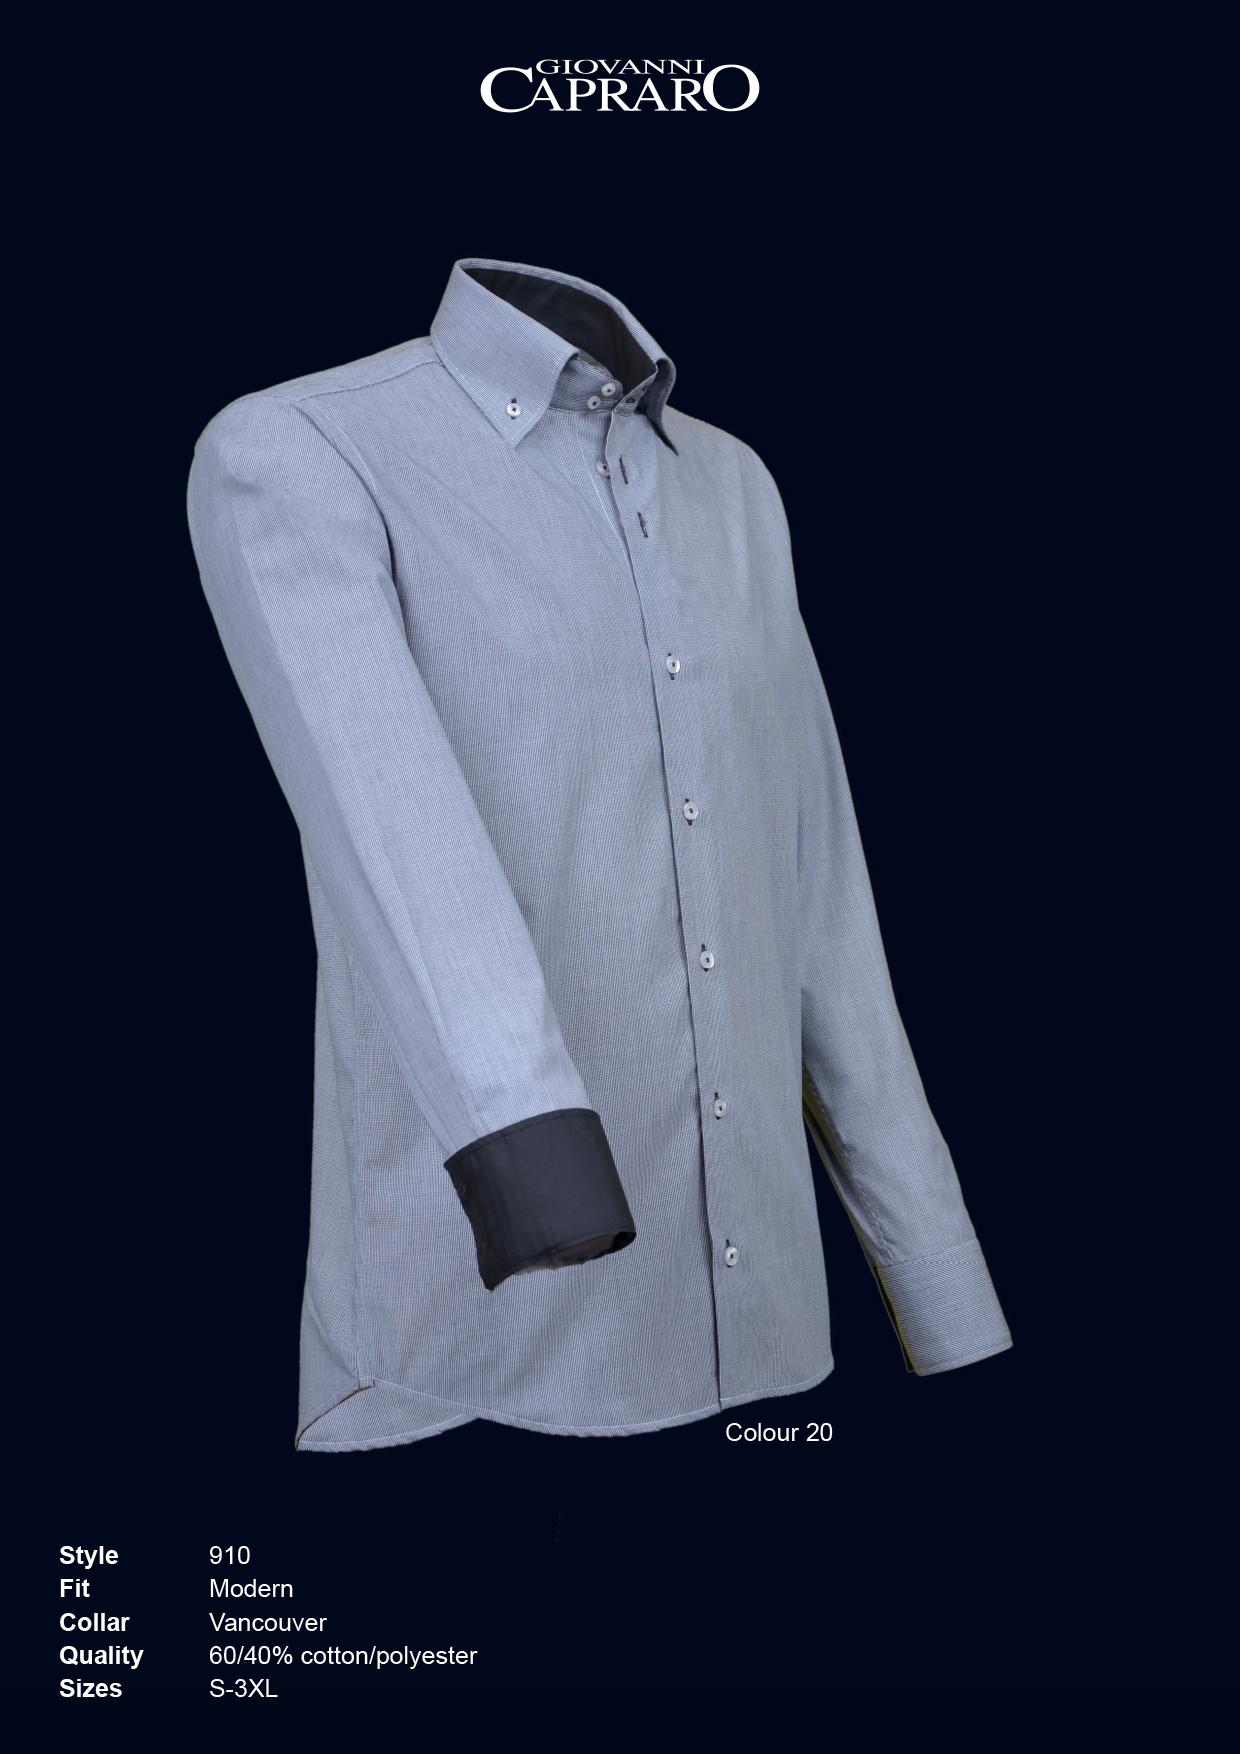 20 Grijs Capraro 910 nl Giovanni Overhemd Allroundkleding oxCeErBQdW